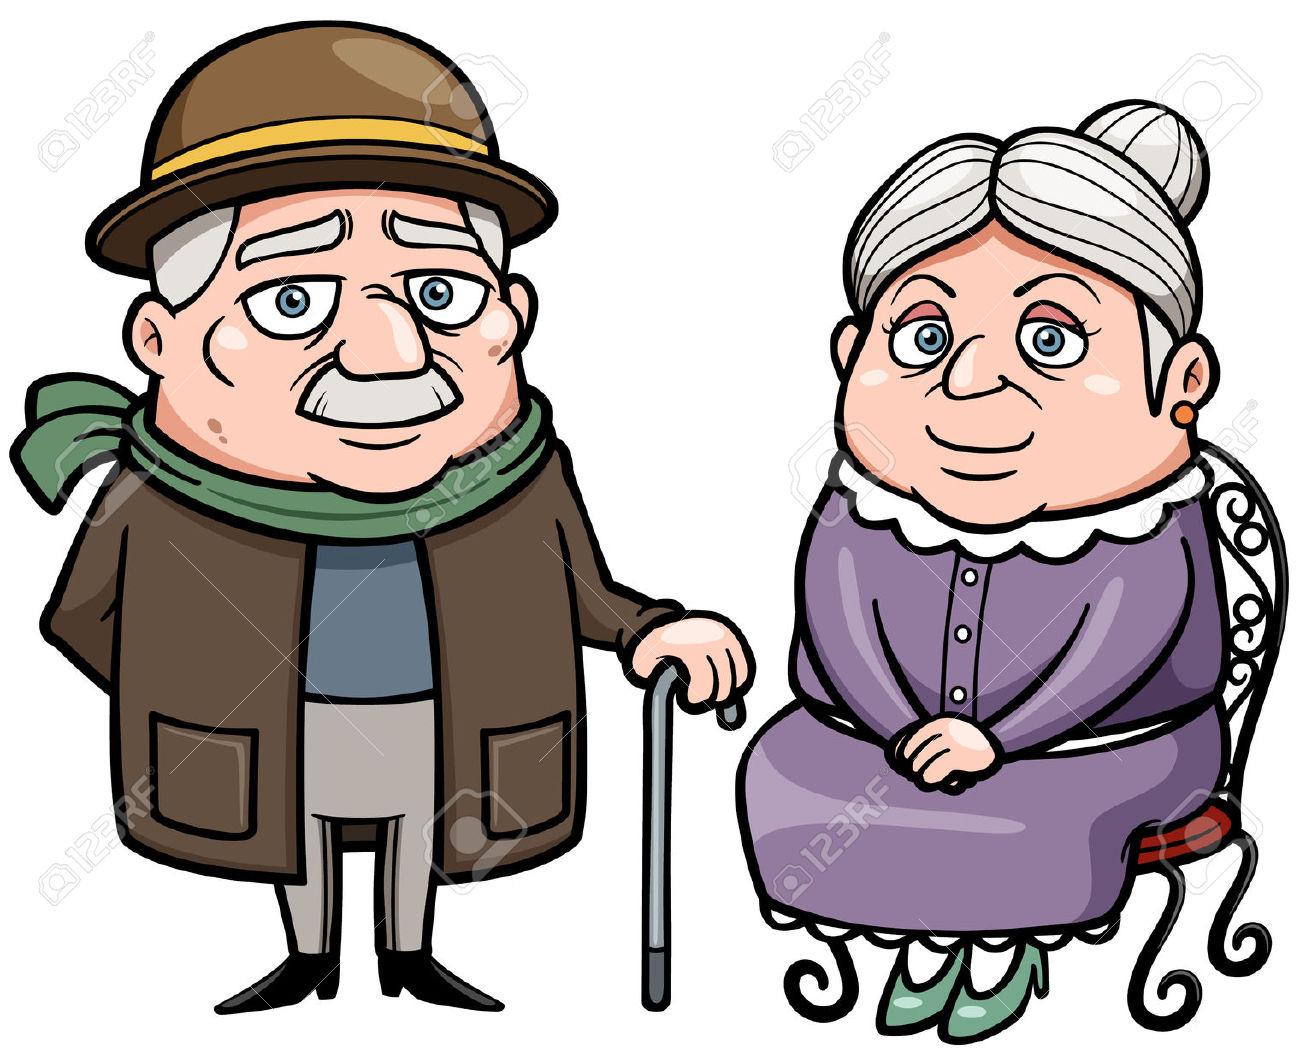 Pics for grandparents cartoon for Dijain photo